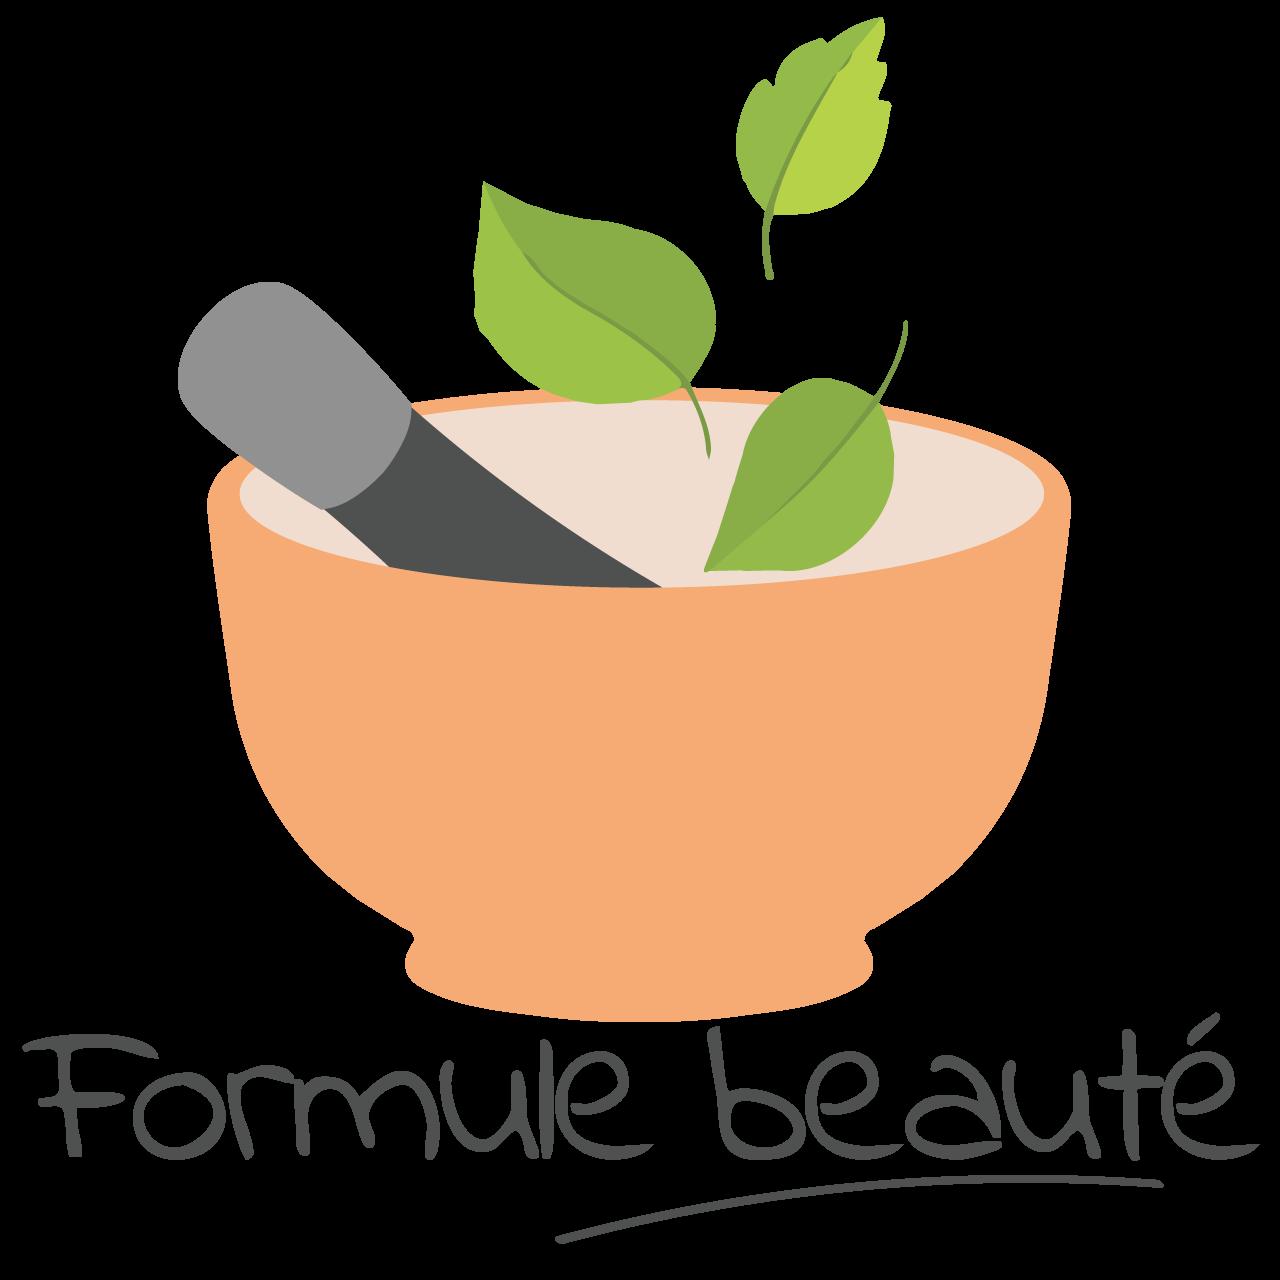 Formule-Beaute-HD.png